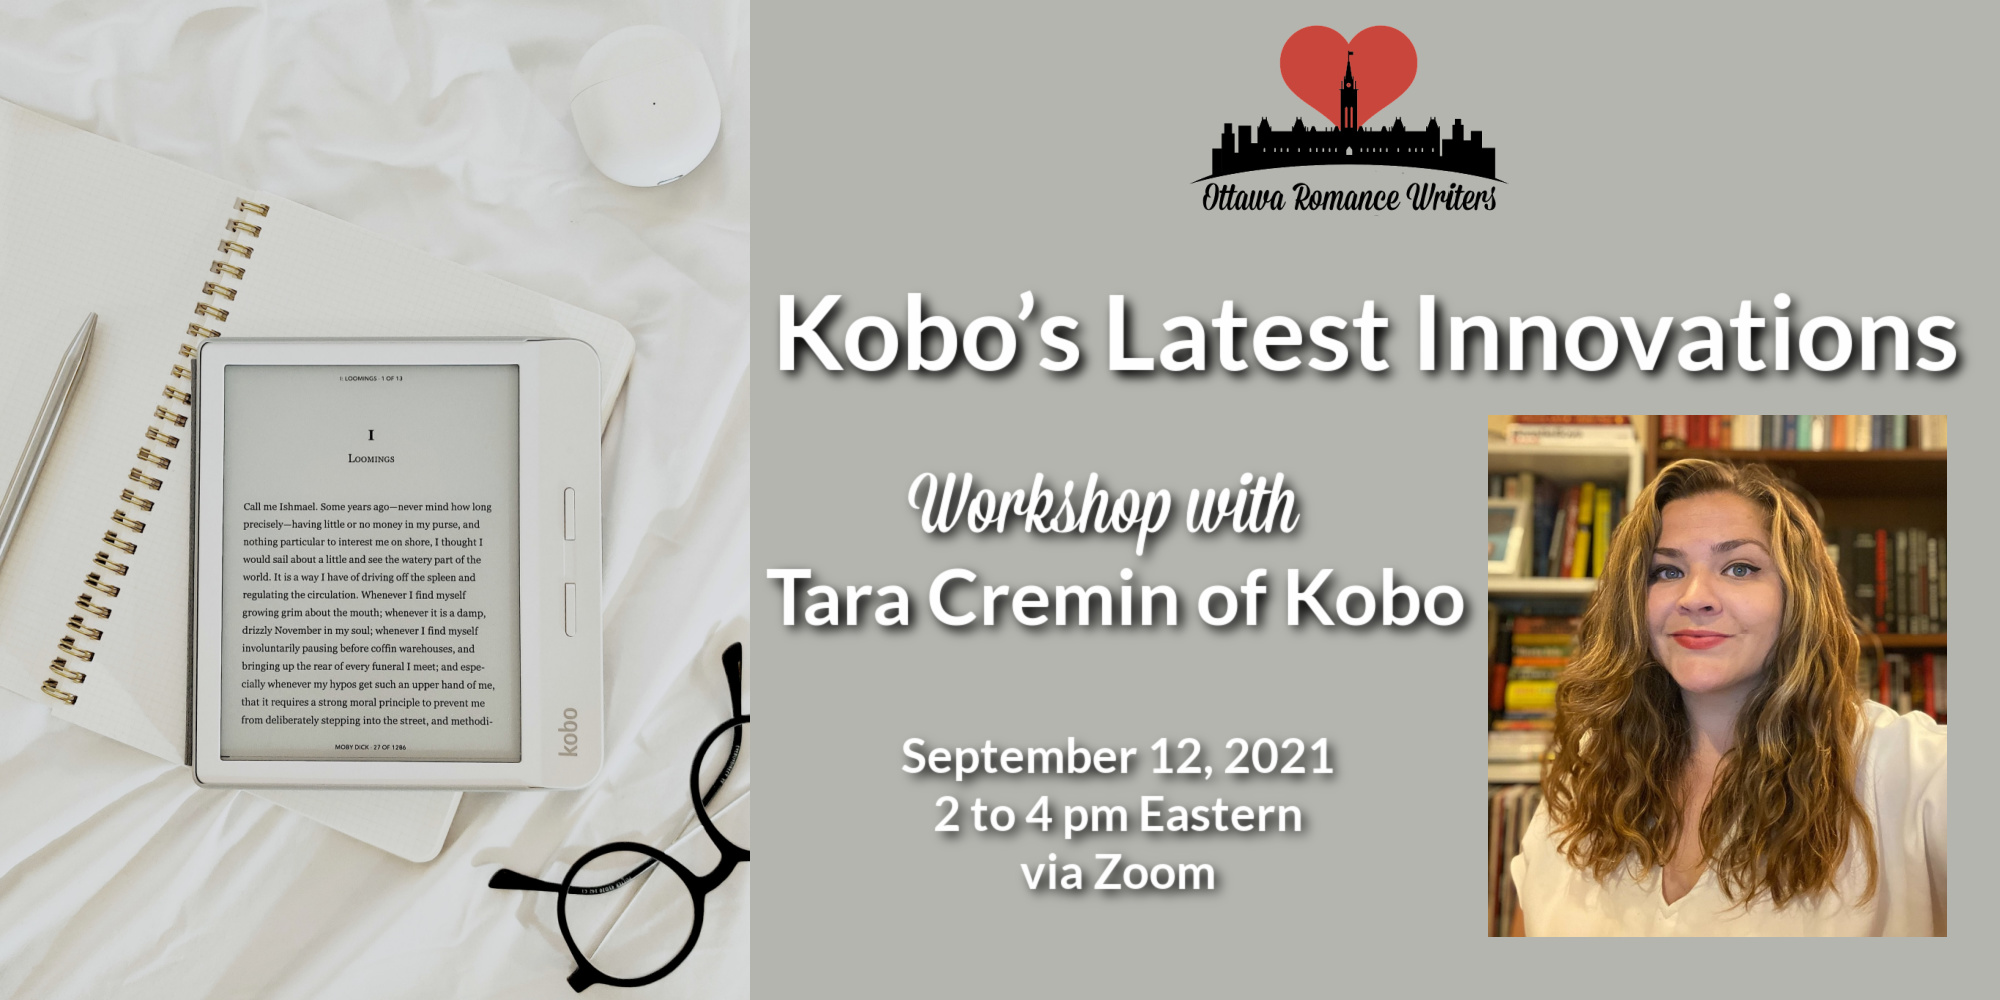 Sept 12, 2021 Workshop: Kobo's Latest Innovations with Tara Cremin